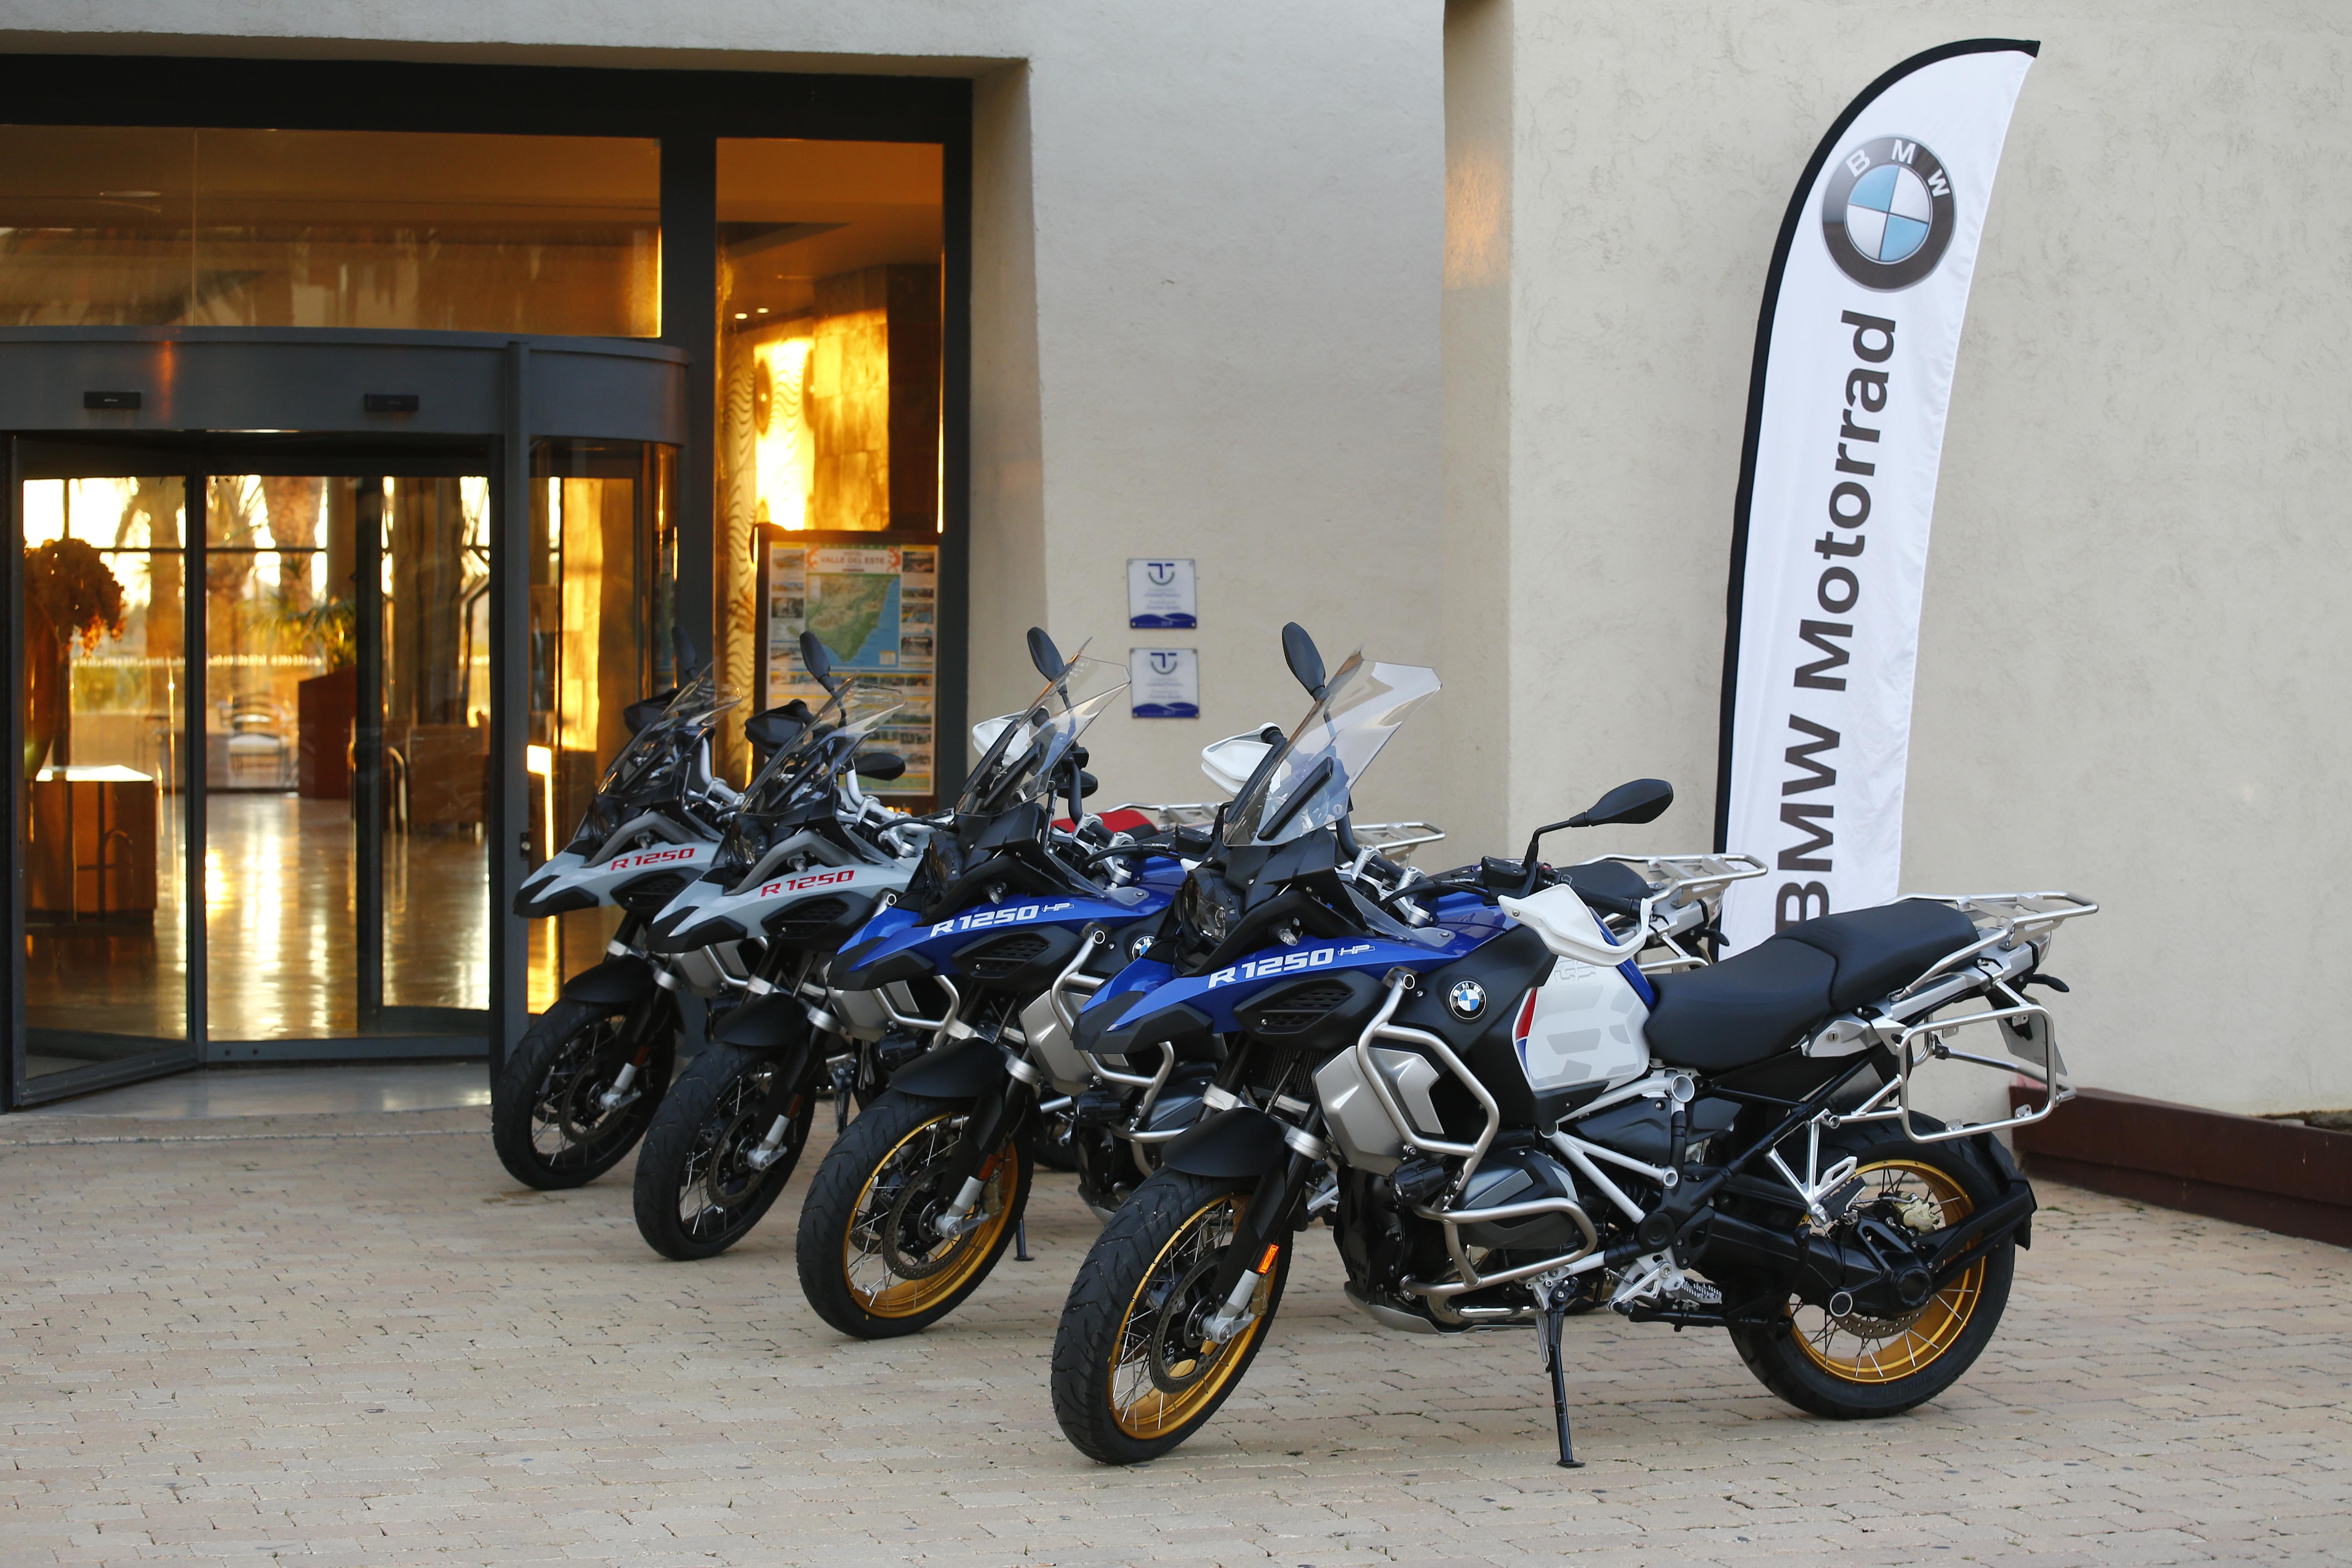 BMW R1250 GS Adventure launch